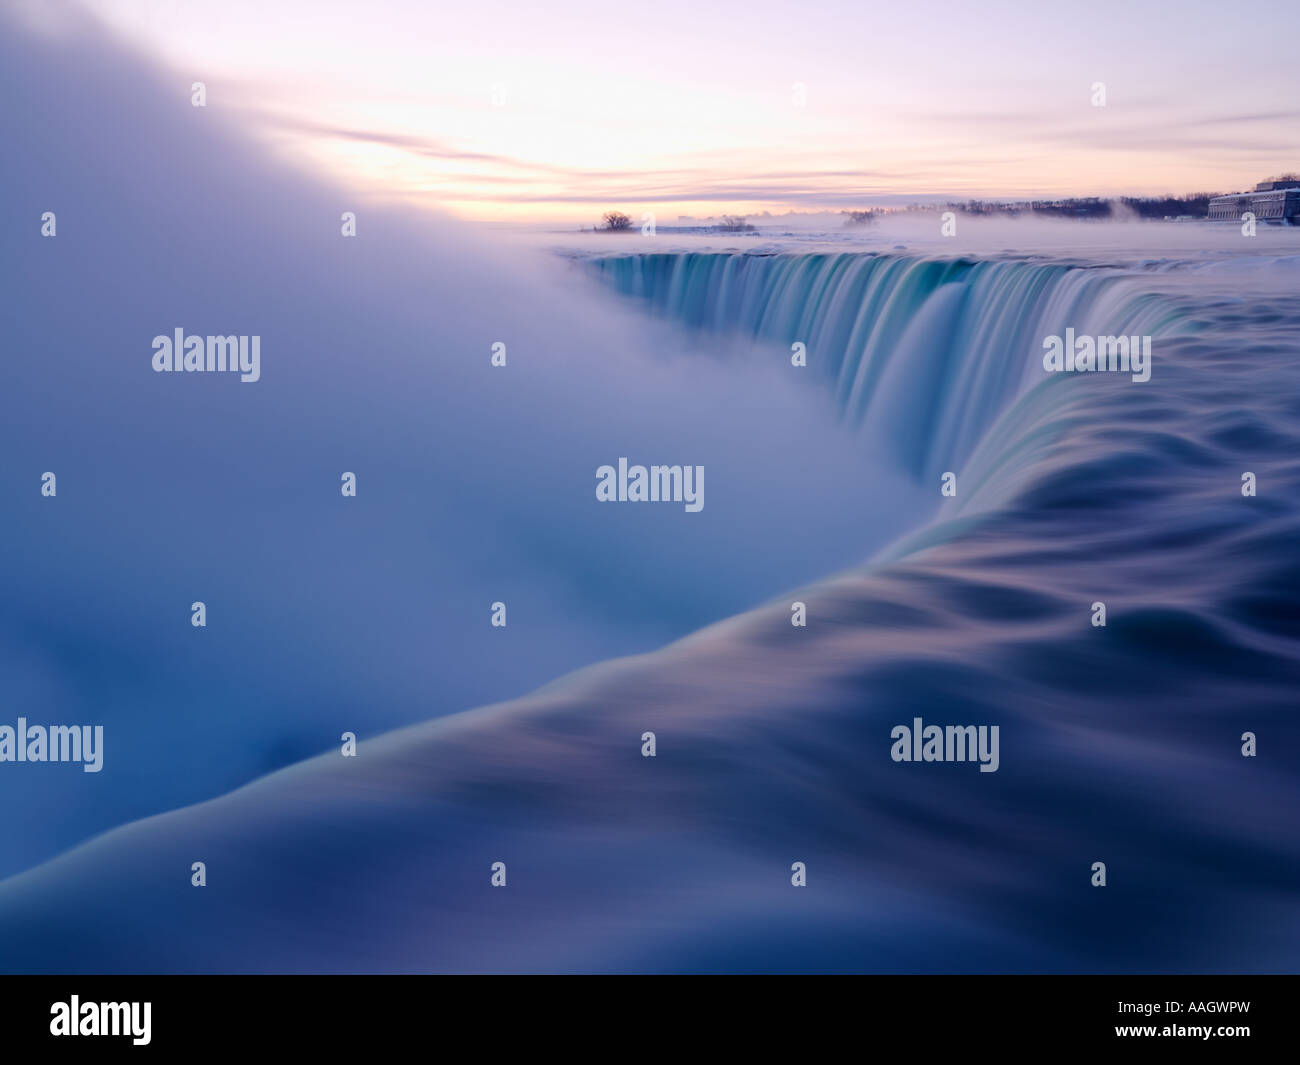 Kanada, Ontario, Niagarafälle bei Sonnenaufgang Stockfoto